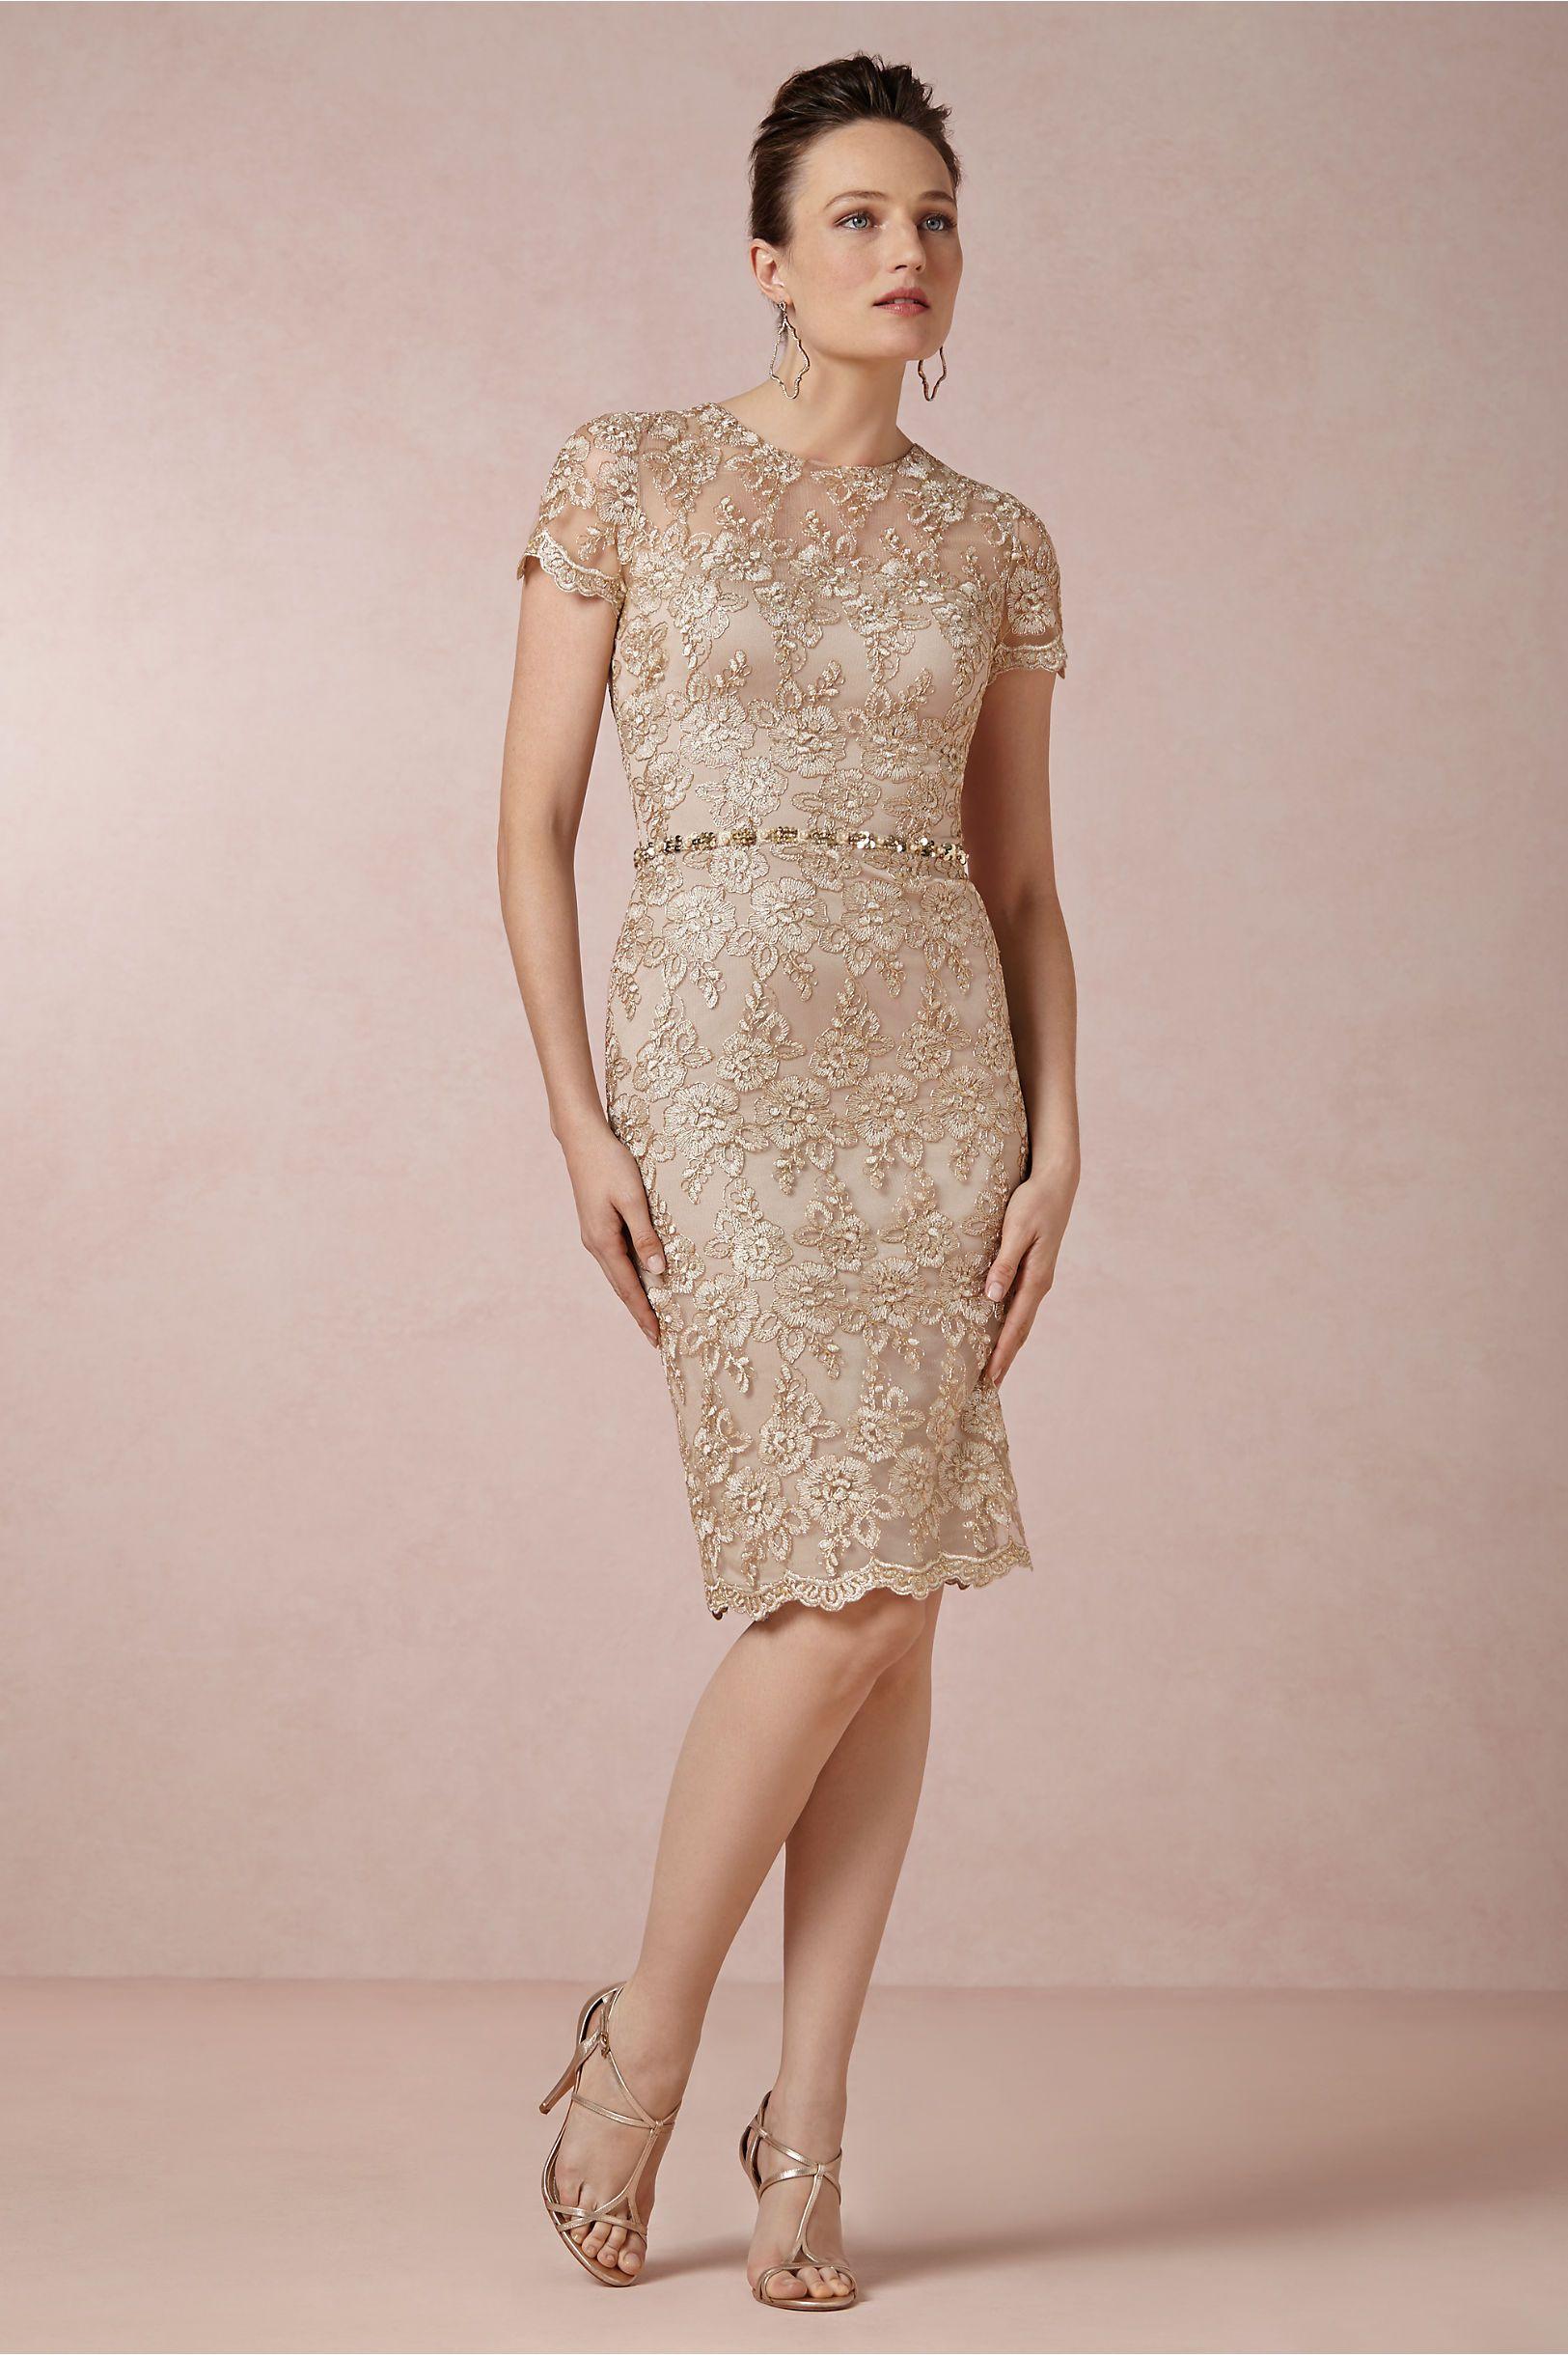 Golden Light Dress | Polyester satin, David meister and Lights